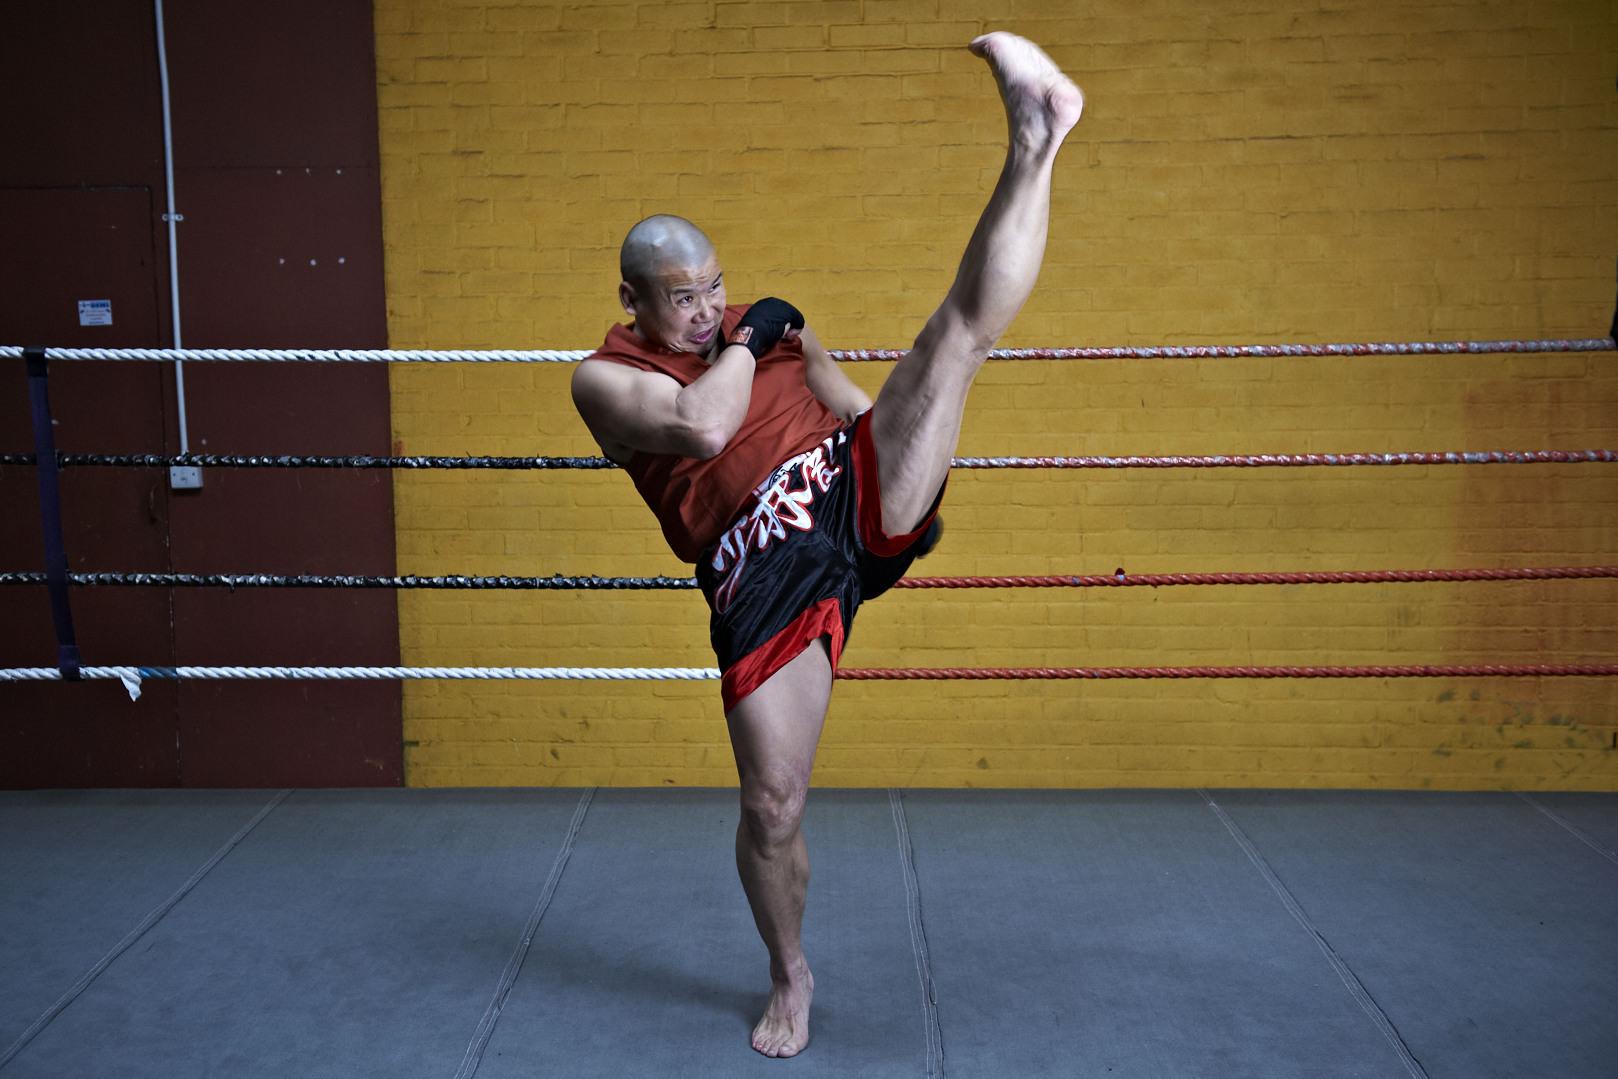 Shaolin temple uk shifu yanzi kick 20.jpg